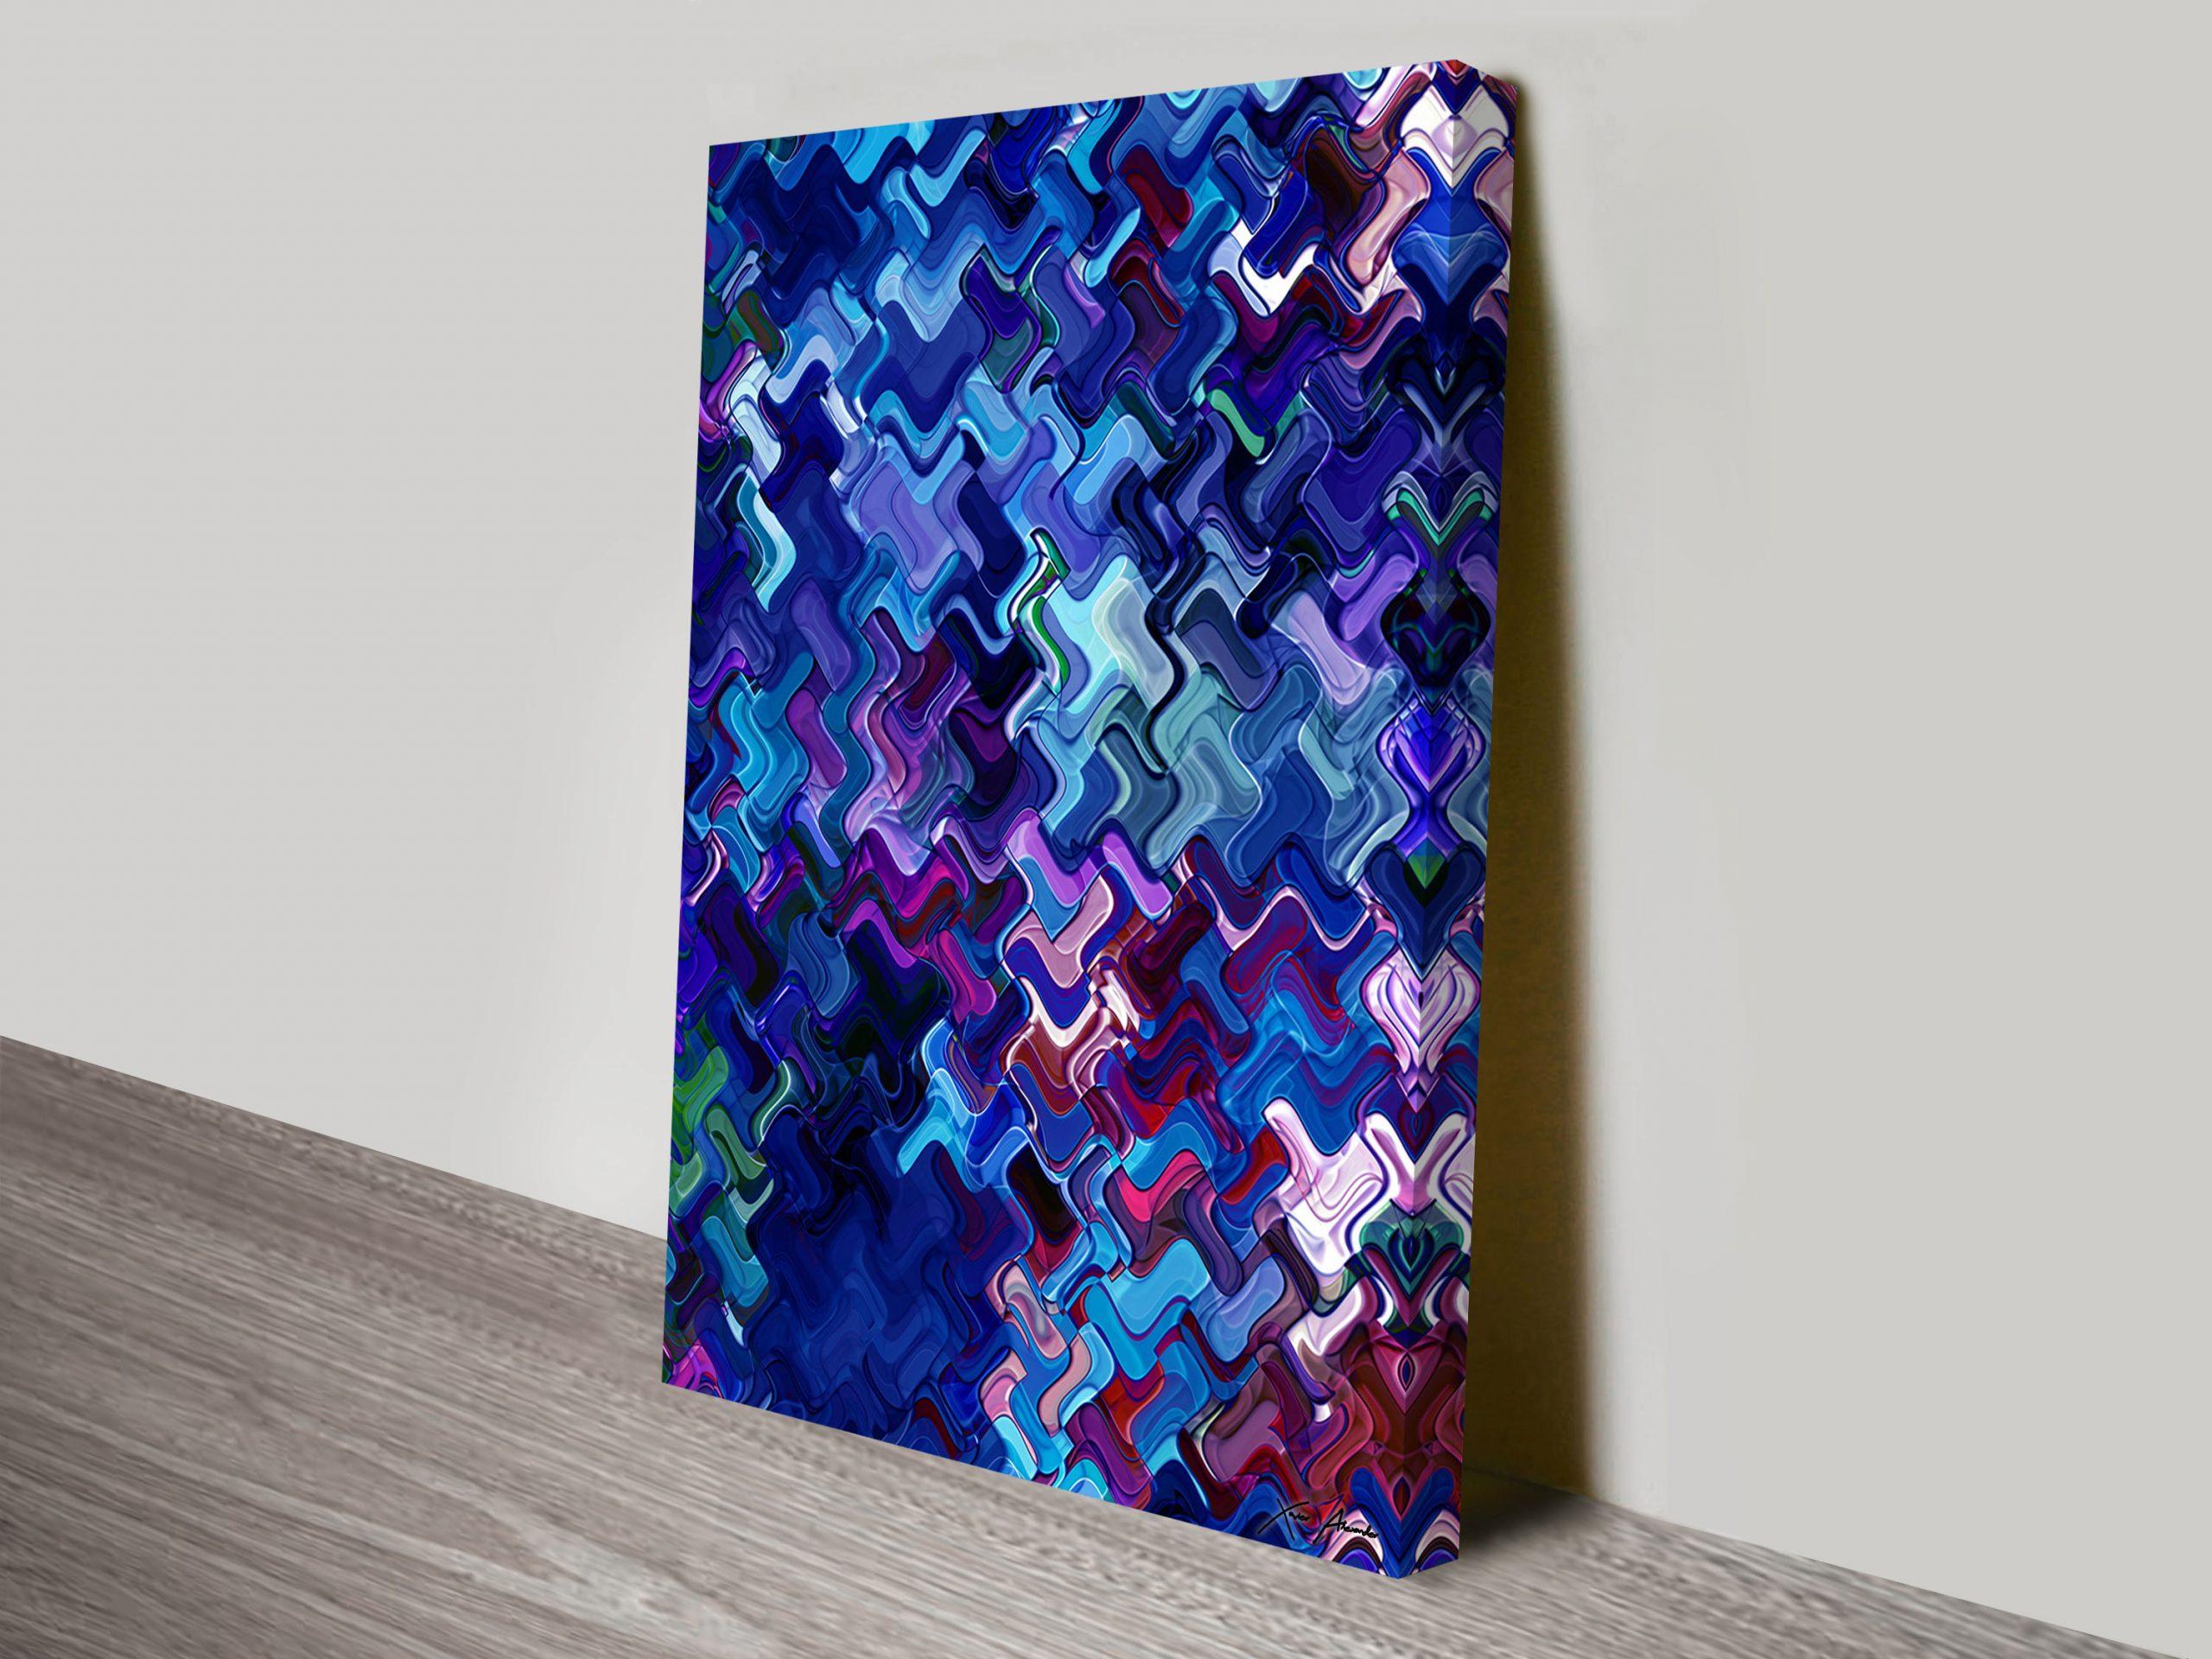 Retrospective Hedonism abstract Wall Art